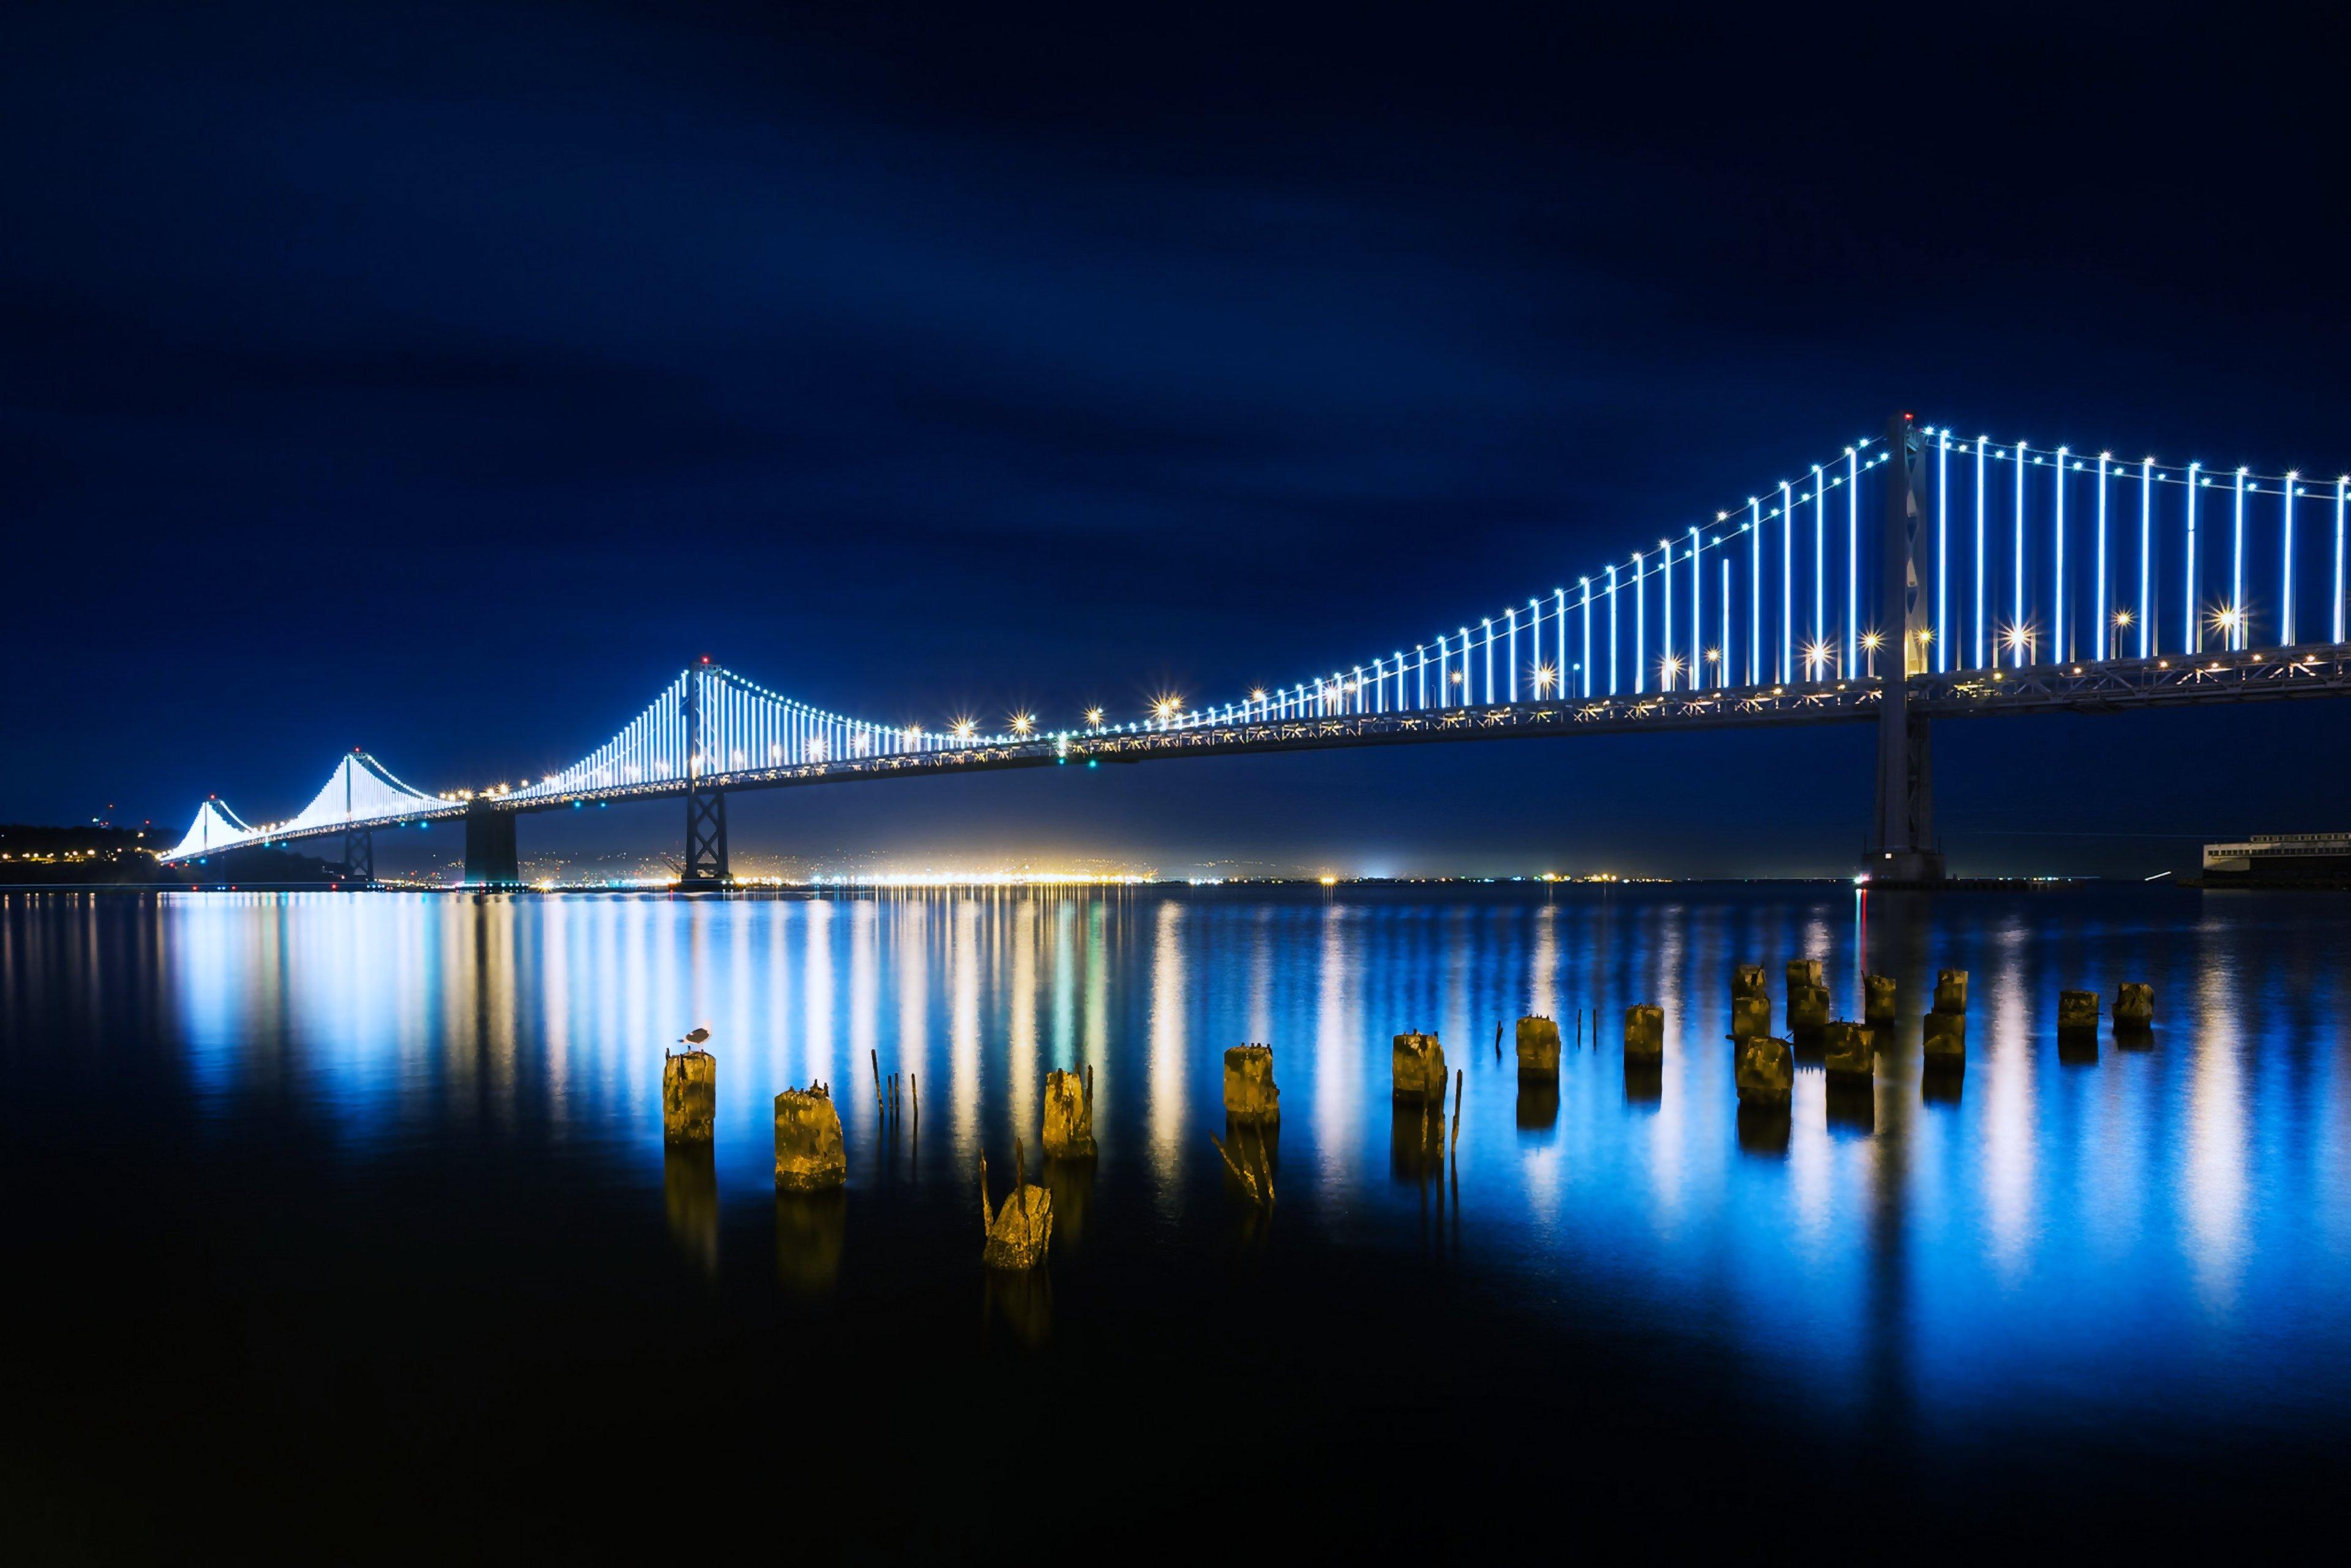 Amazing Wallpaper Night Golden Gate Bridge - fdb155c4c1f77dbc602db201dd35b4a9  Picture-47020.jpg